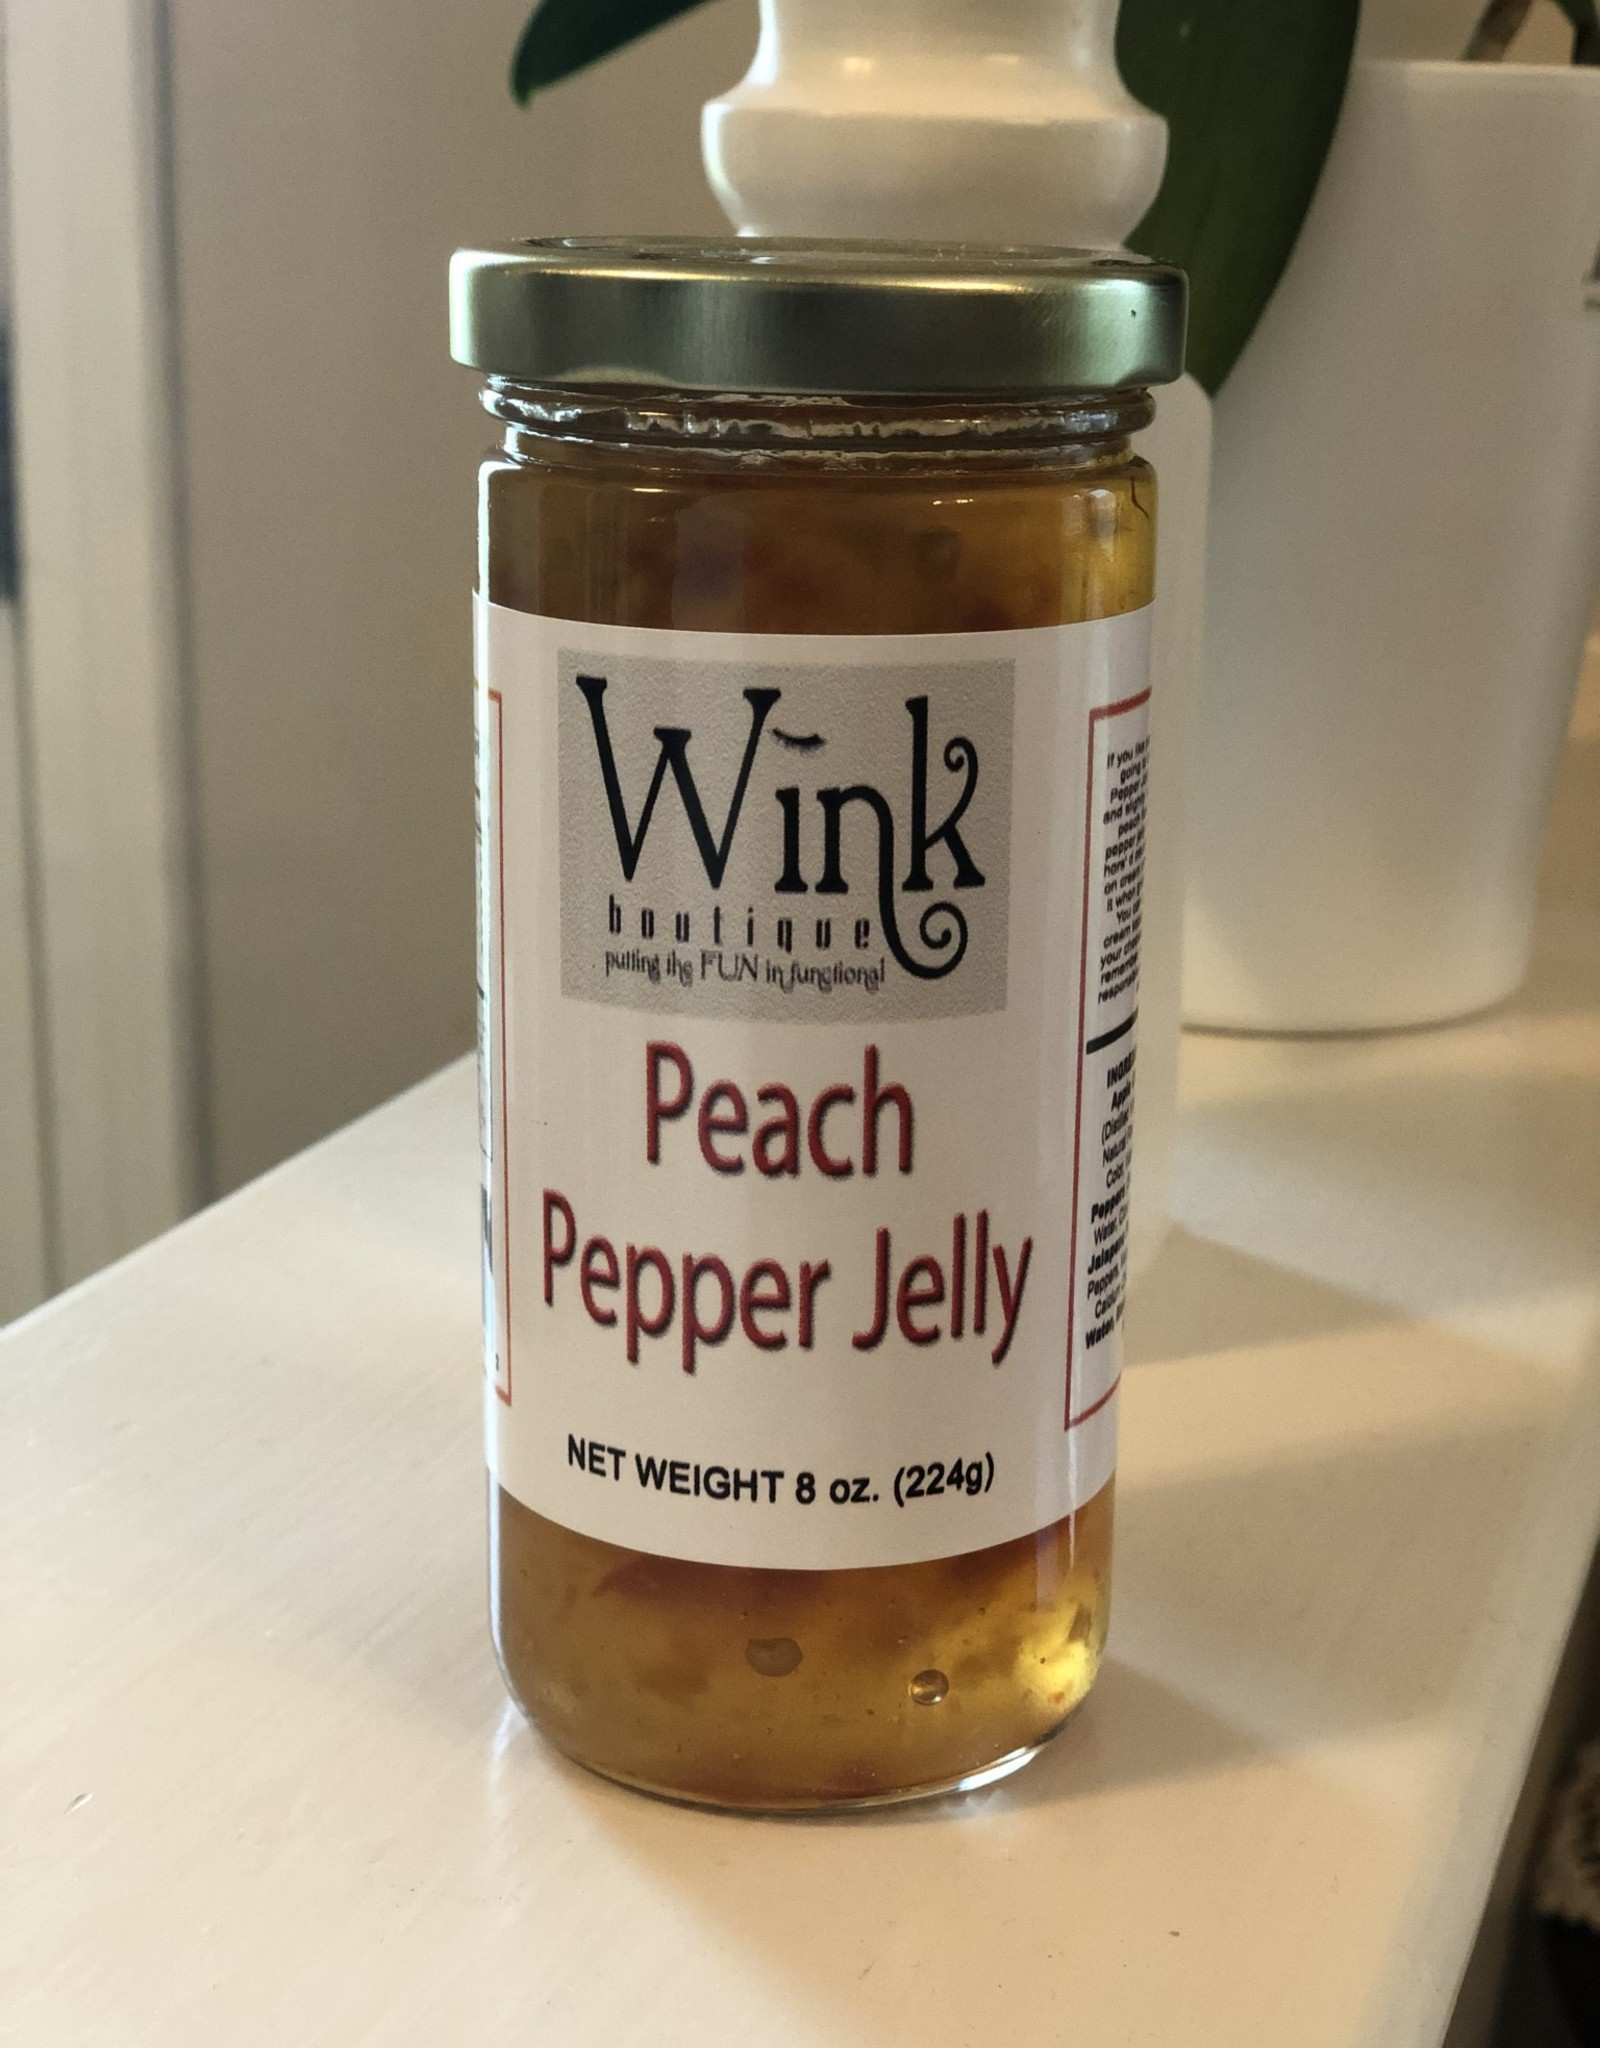 Wink Peach Pepper Jelly